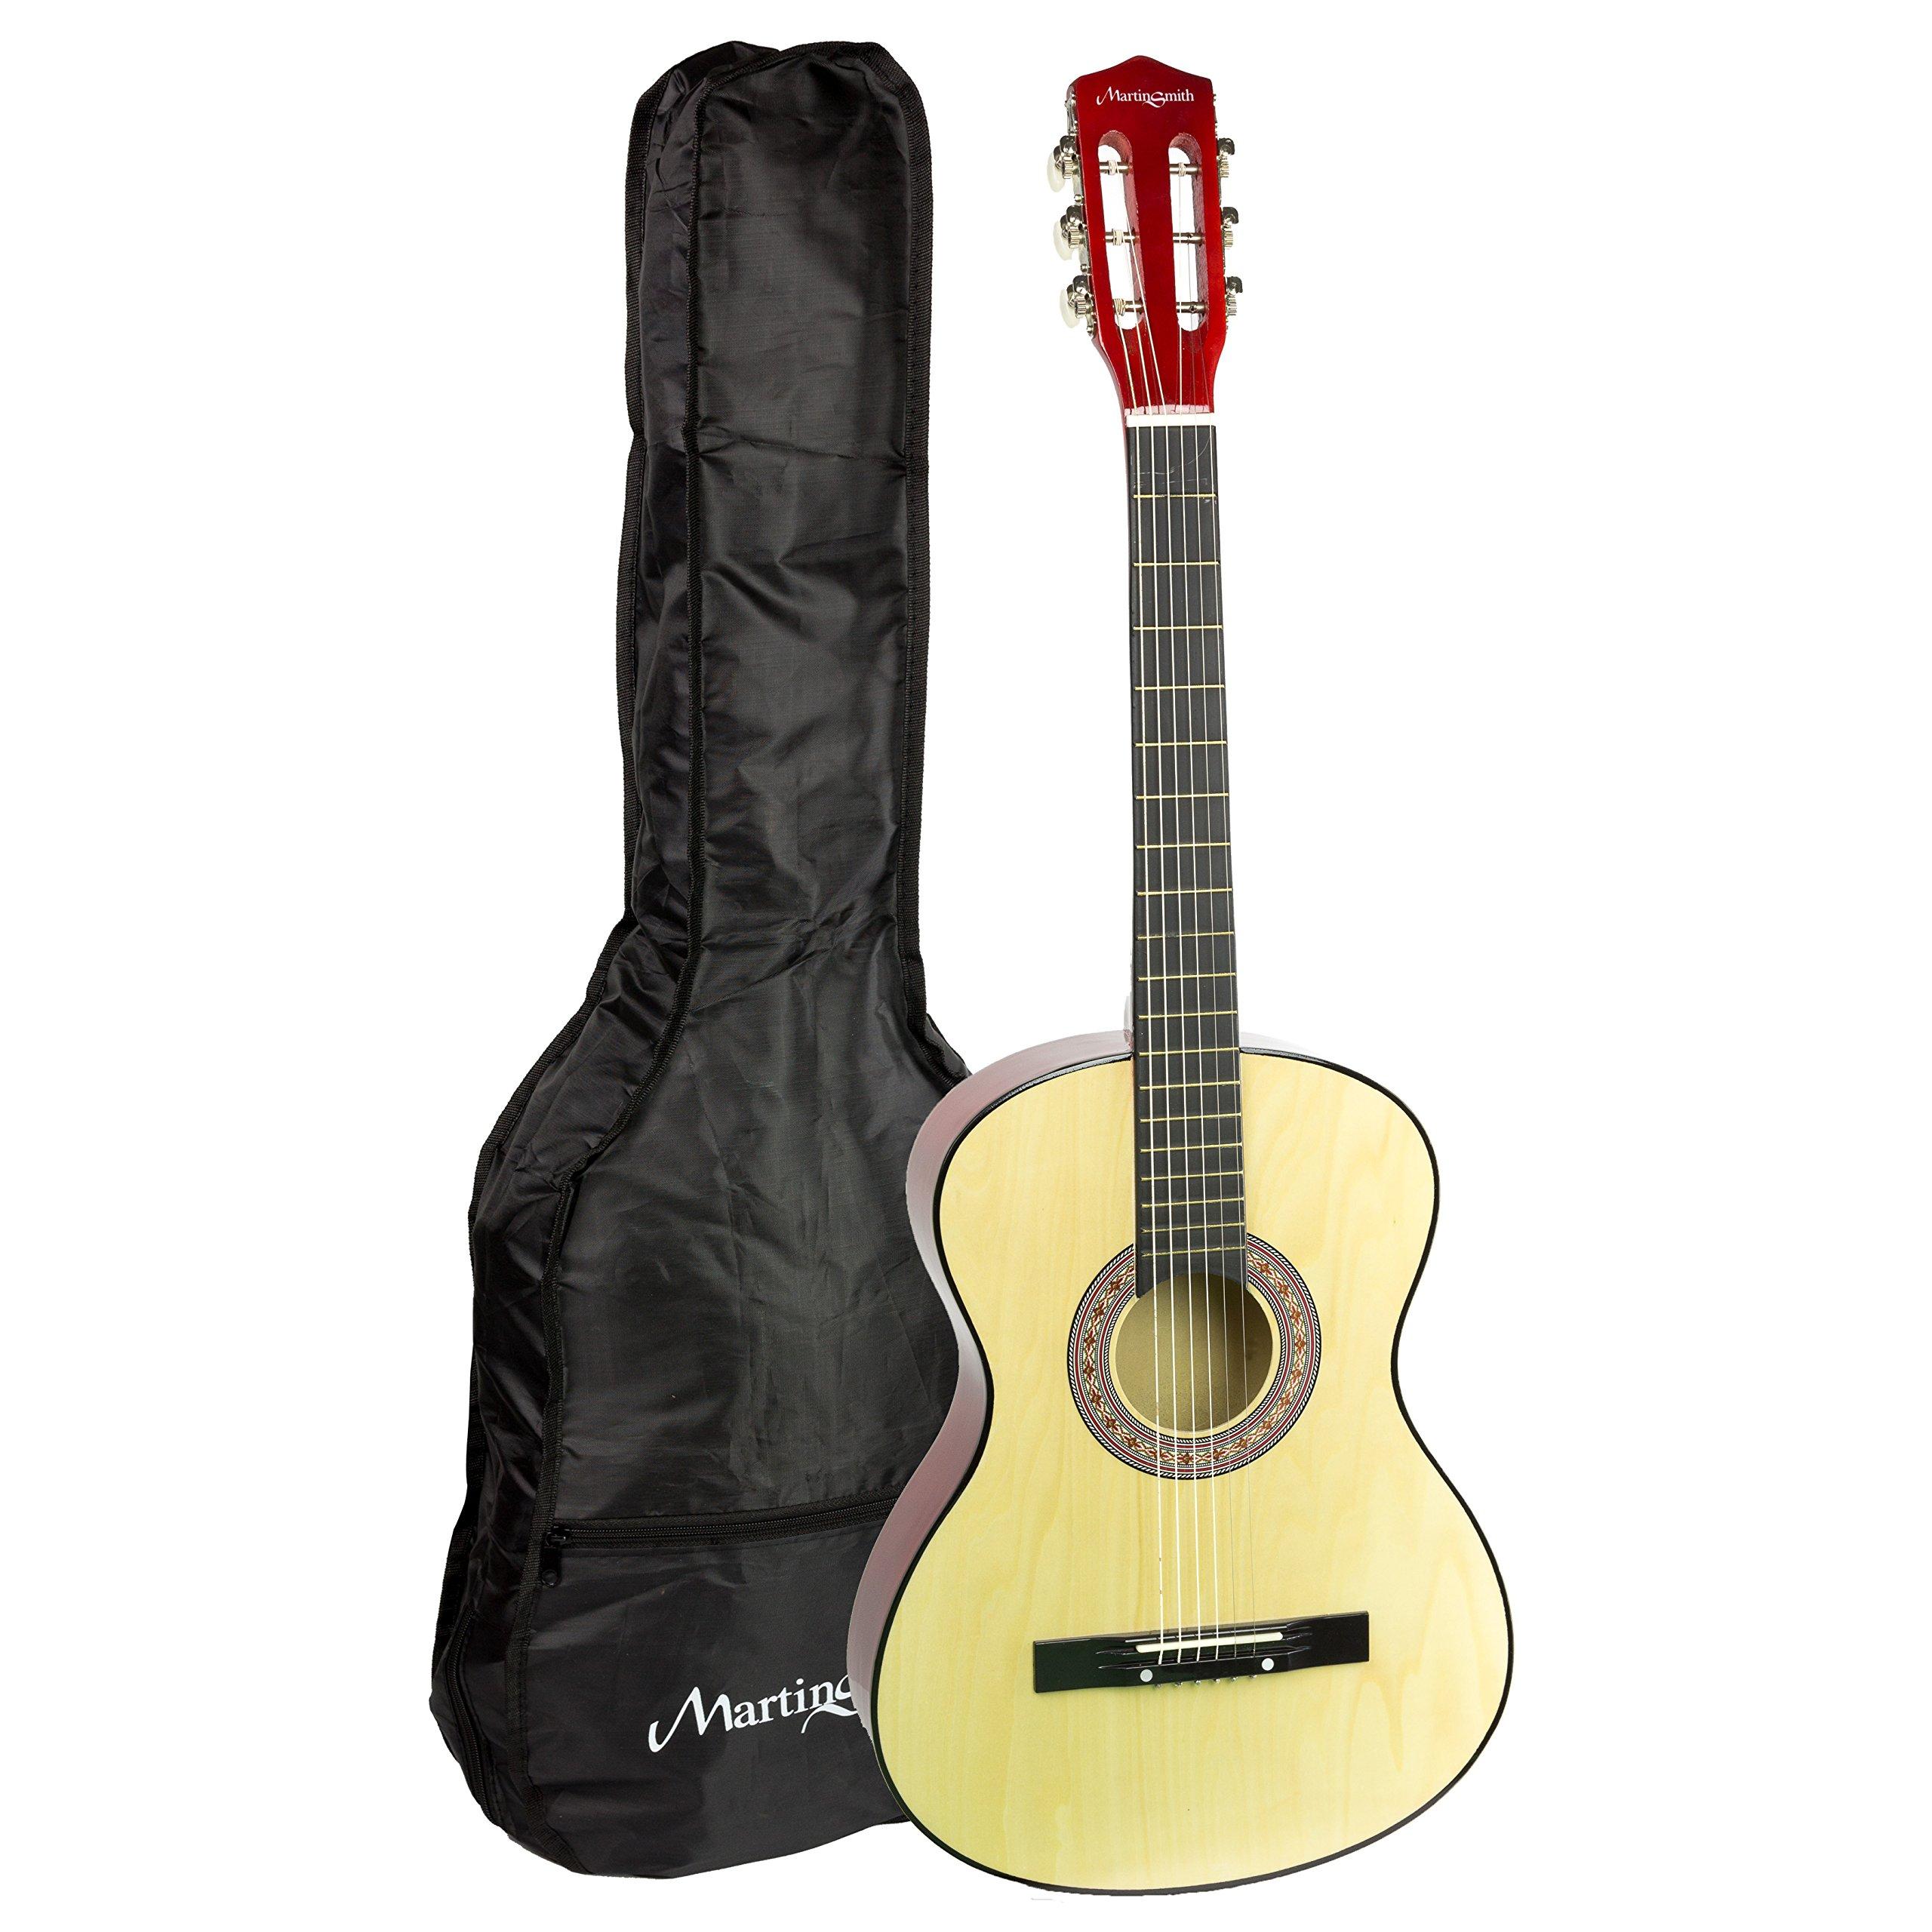 Martin Smith Acoustic Guitar Pack Guitar Yurt